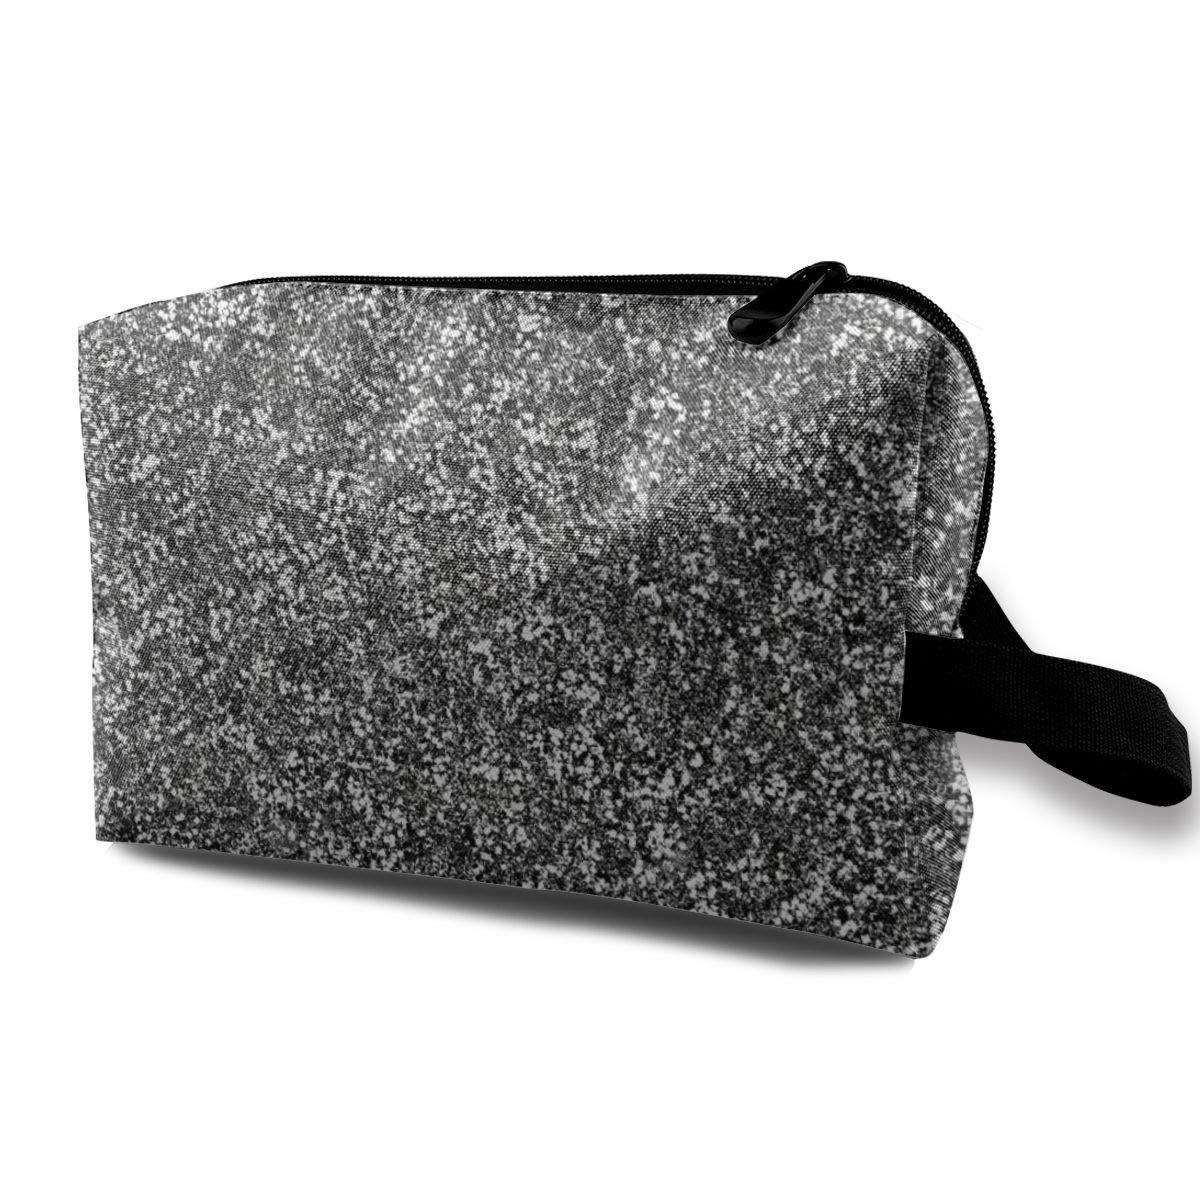 Makeup Bag Cosmetic Toiletry Travel Bag Silver Flake Glitter Organizer Pouch For Women Men